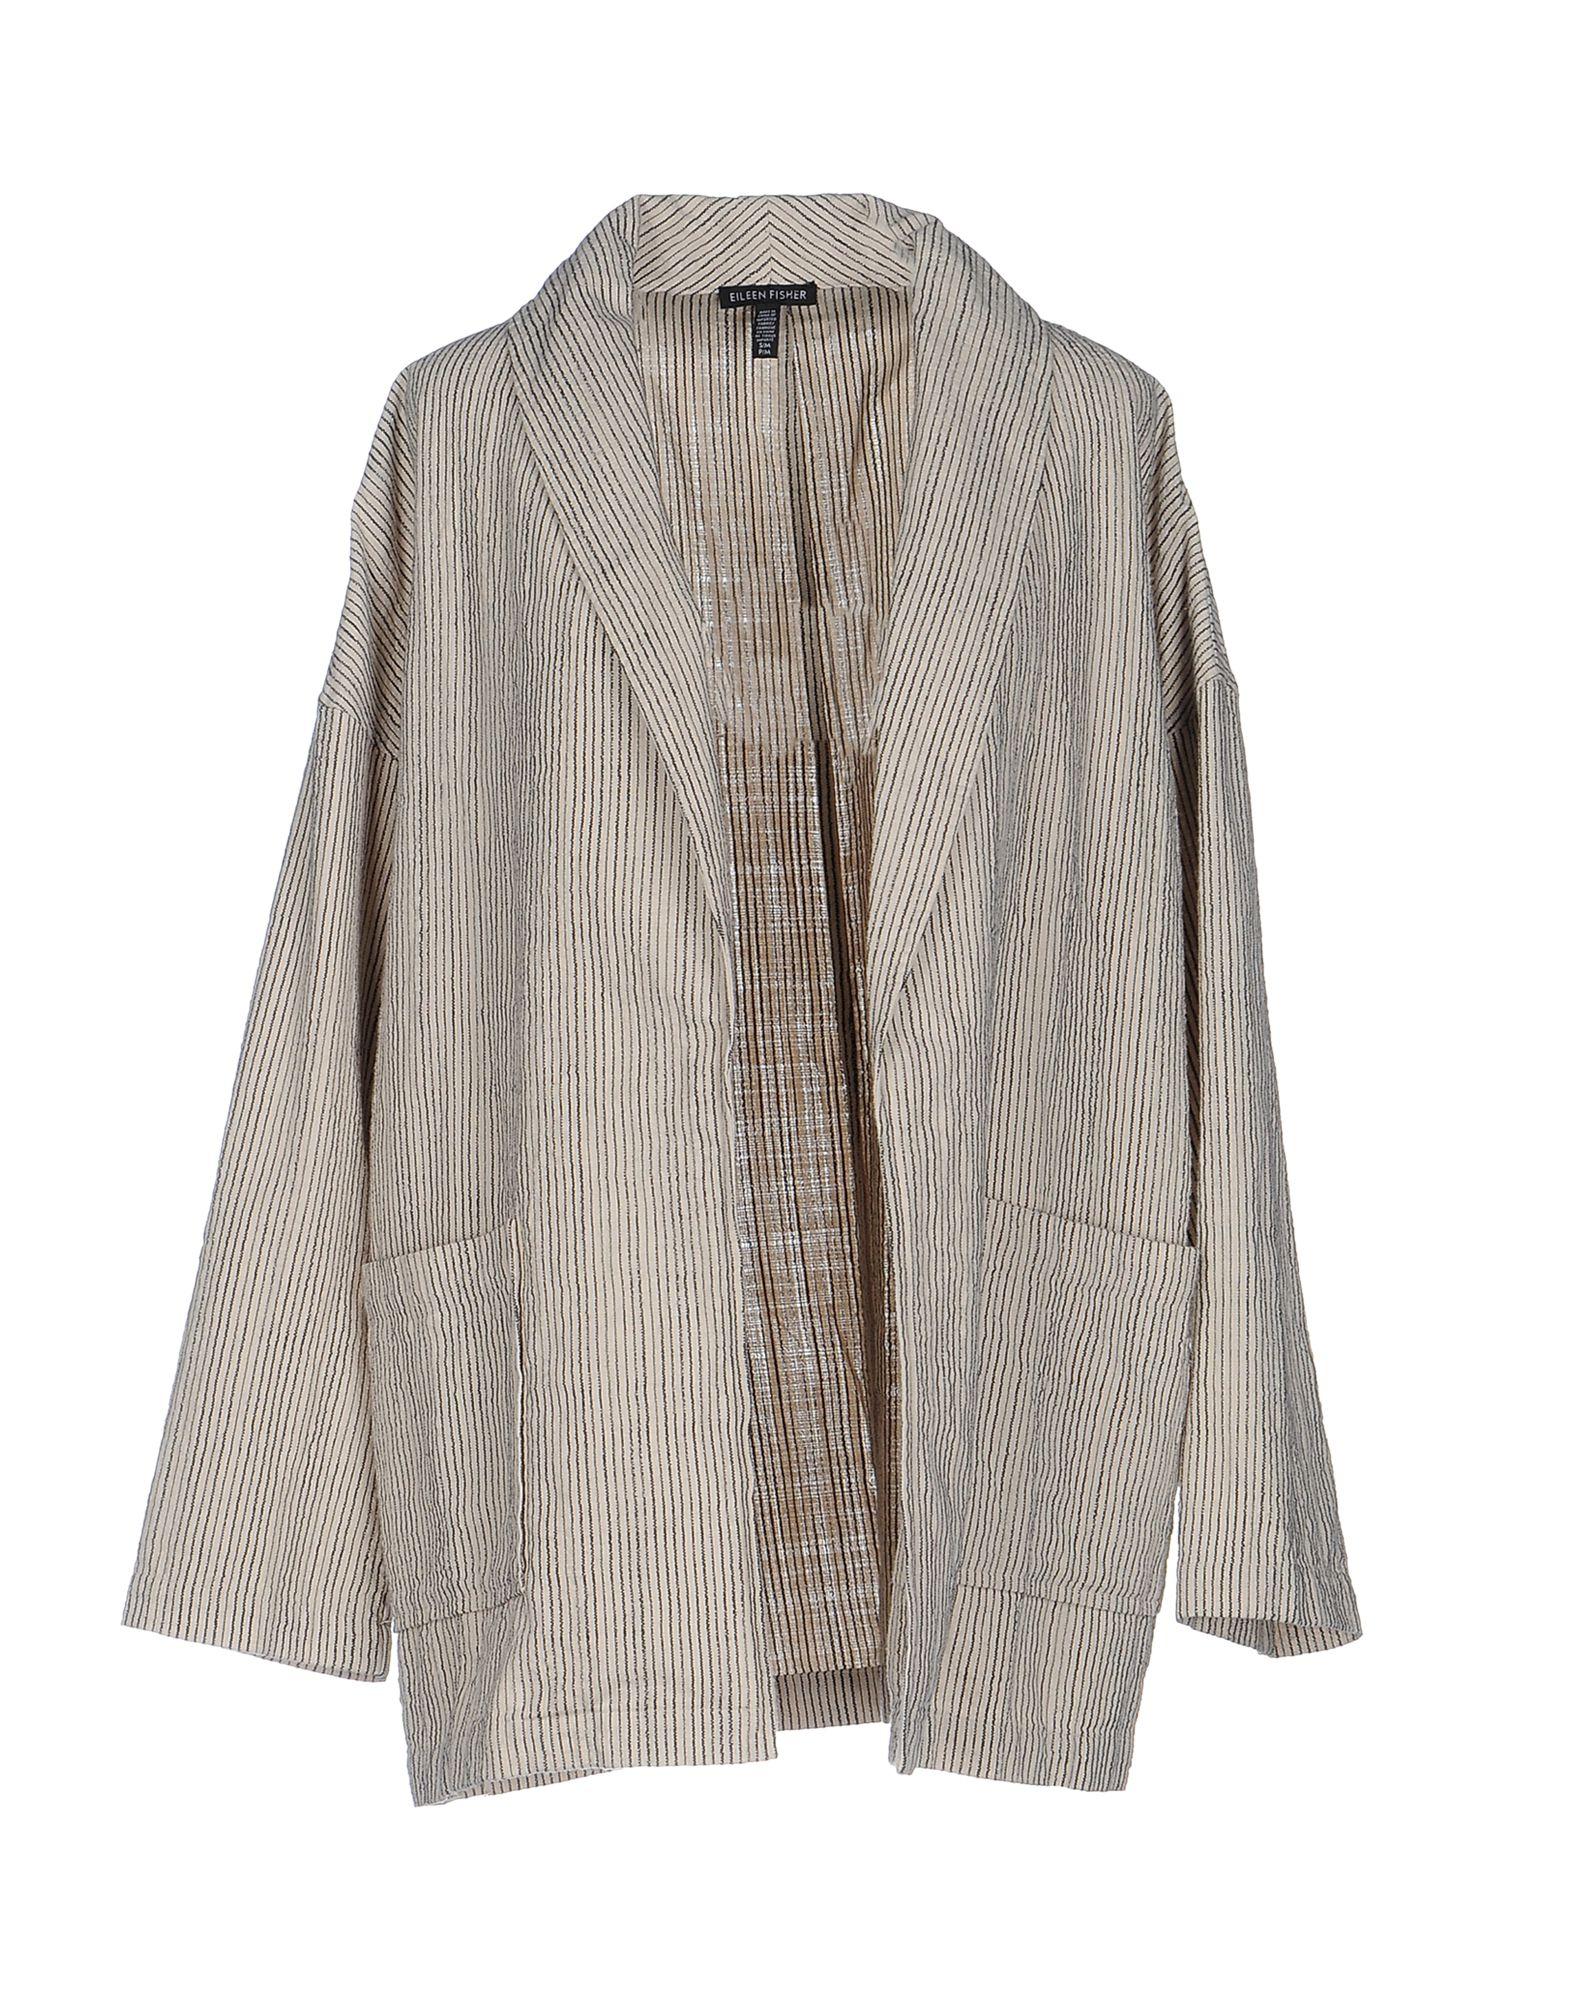 EILEEN FISHER Пиджак eileen fisher new black long sleeve drape top msrp $278 00